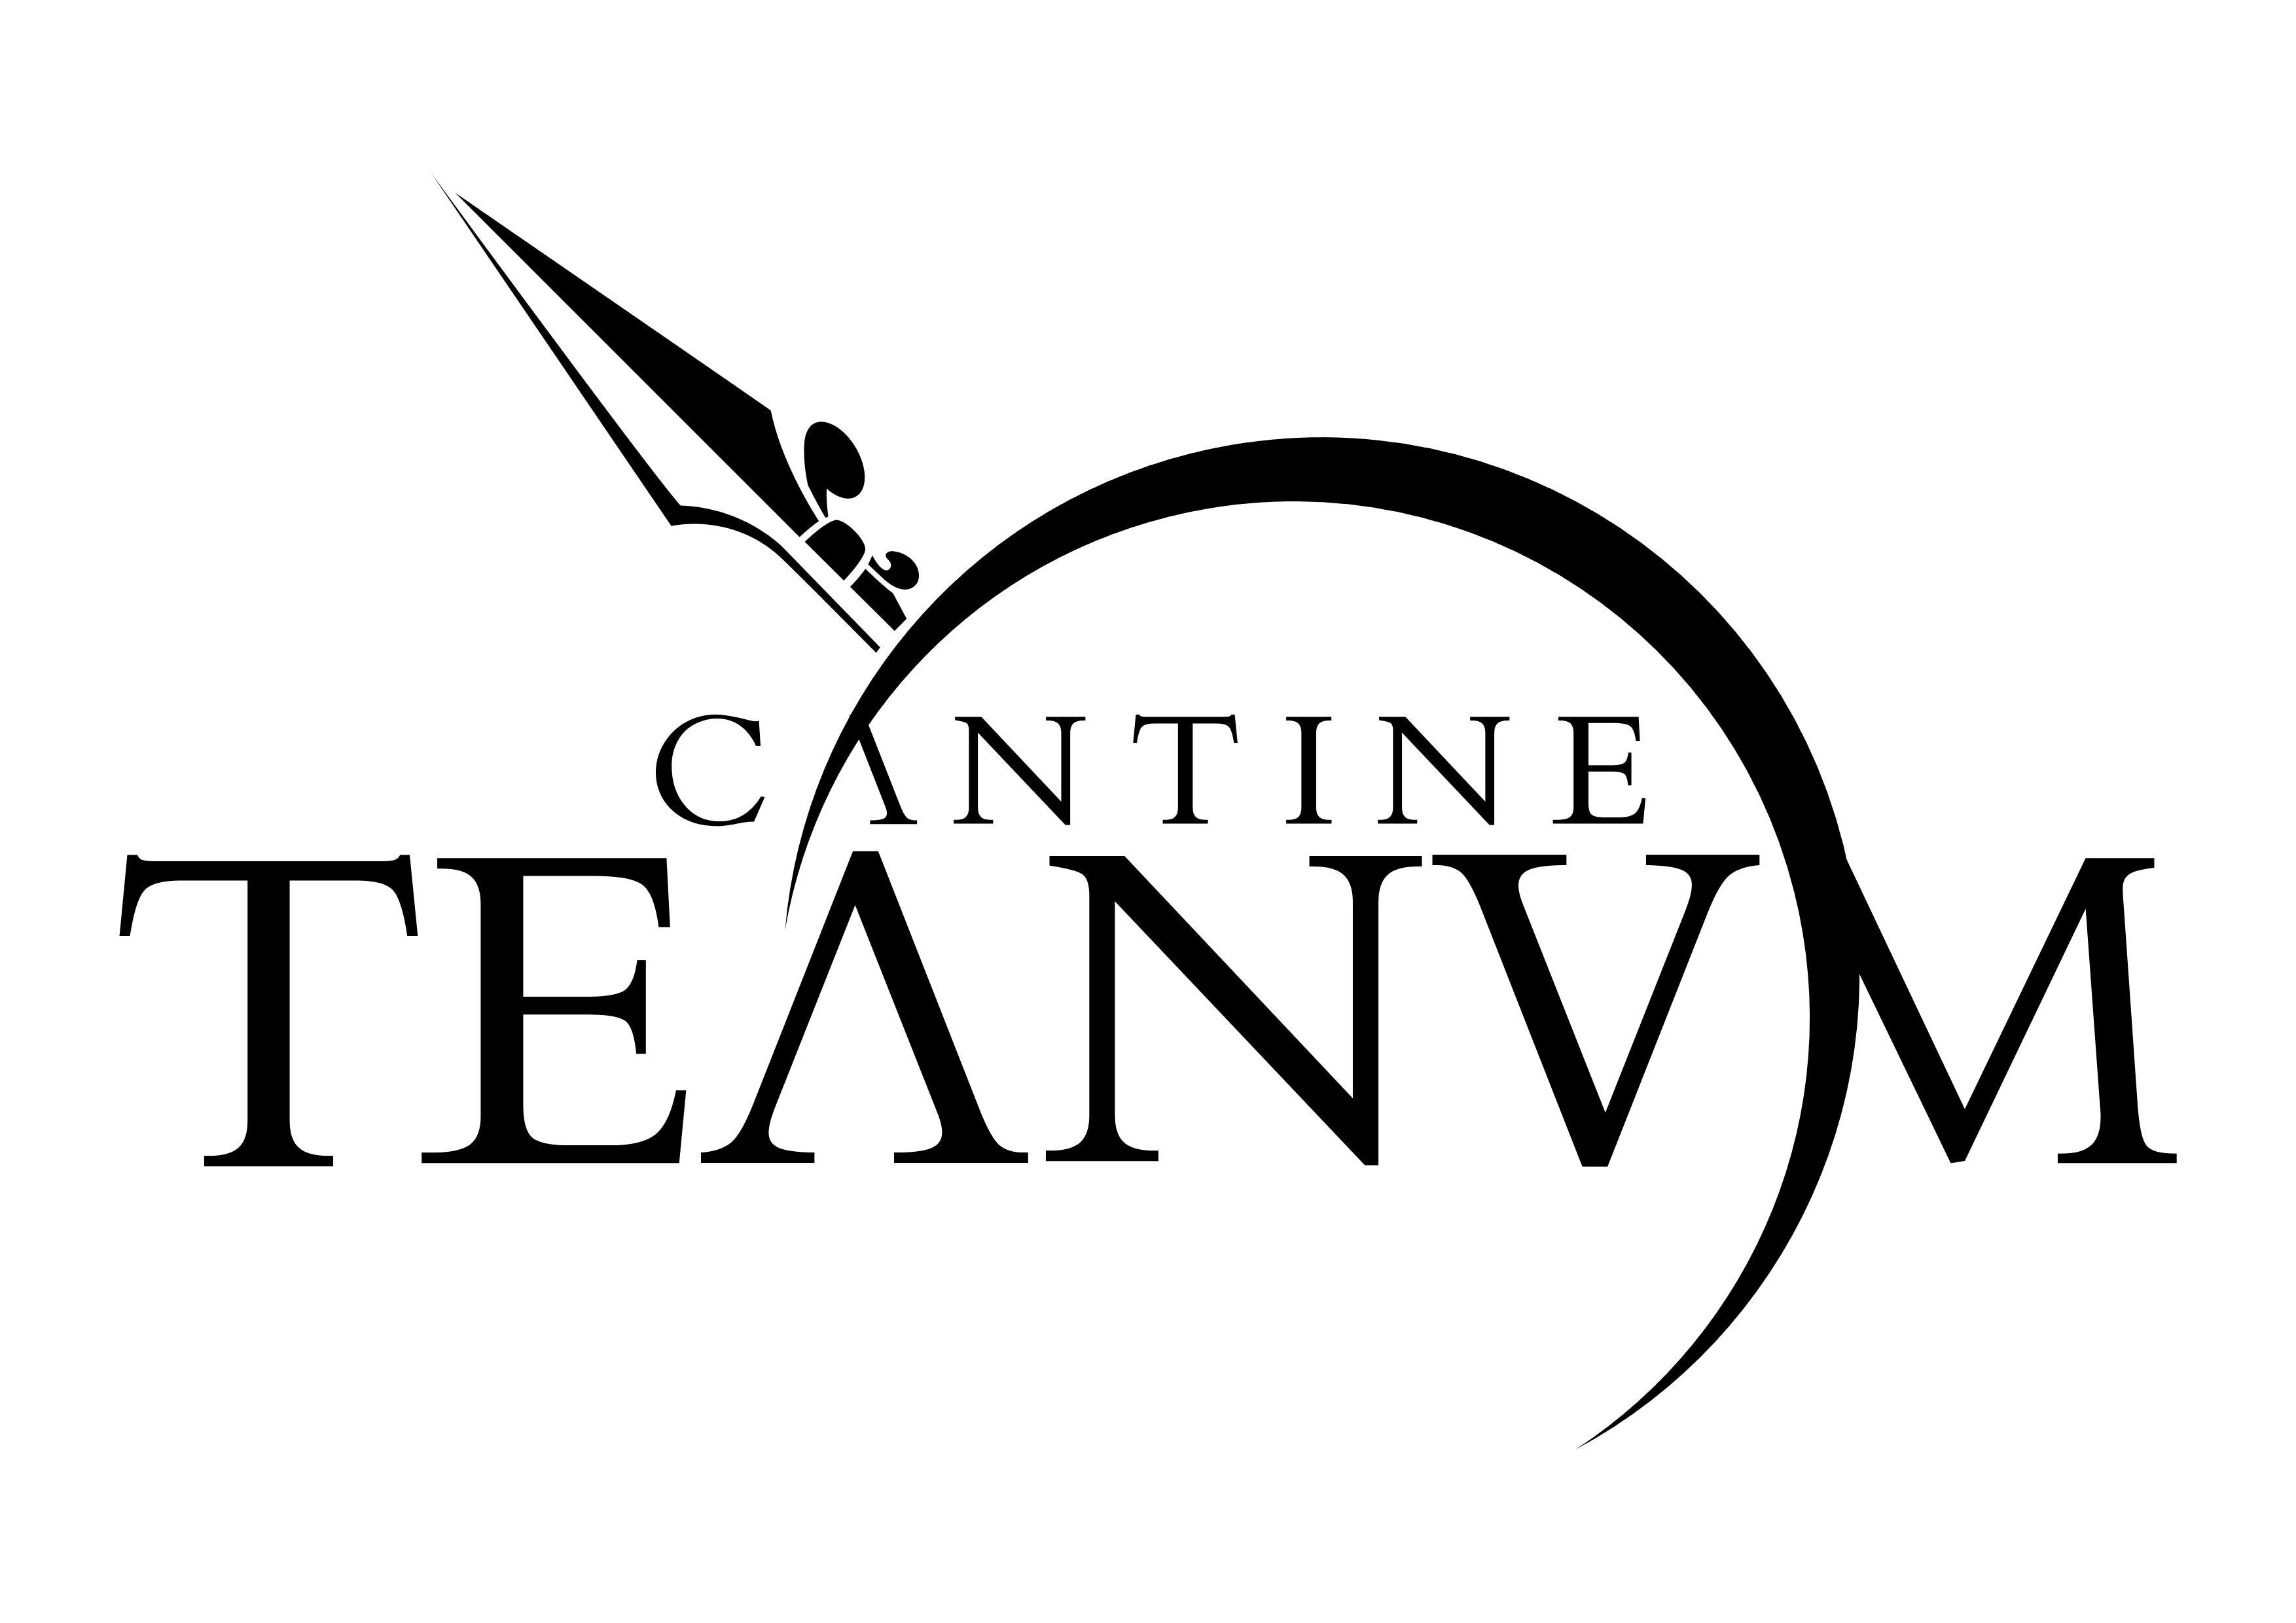 CANTINE TEANUM/テアヌム